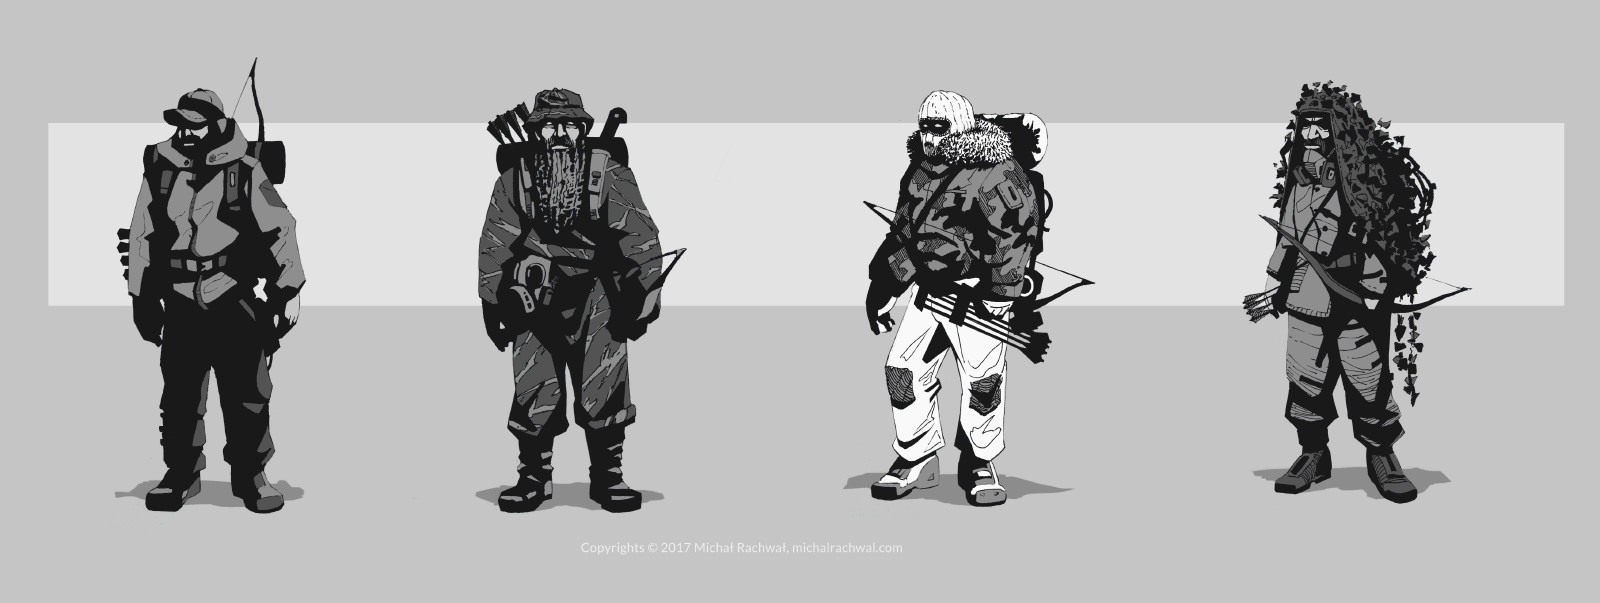 Michal rachwal michal rachwal hunter sketches1